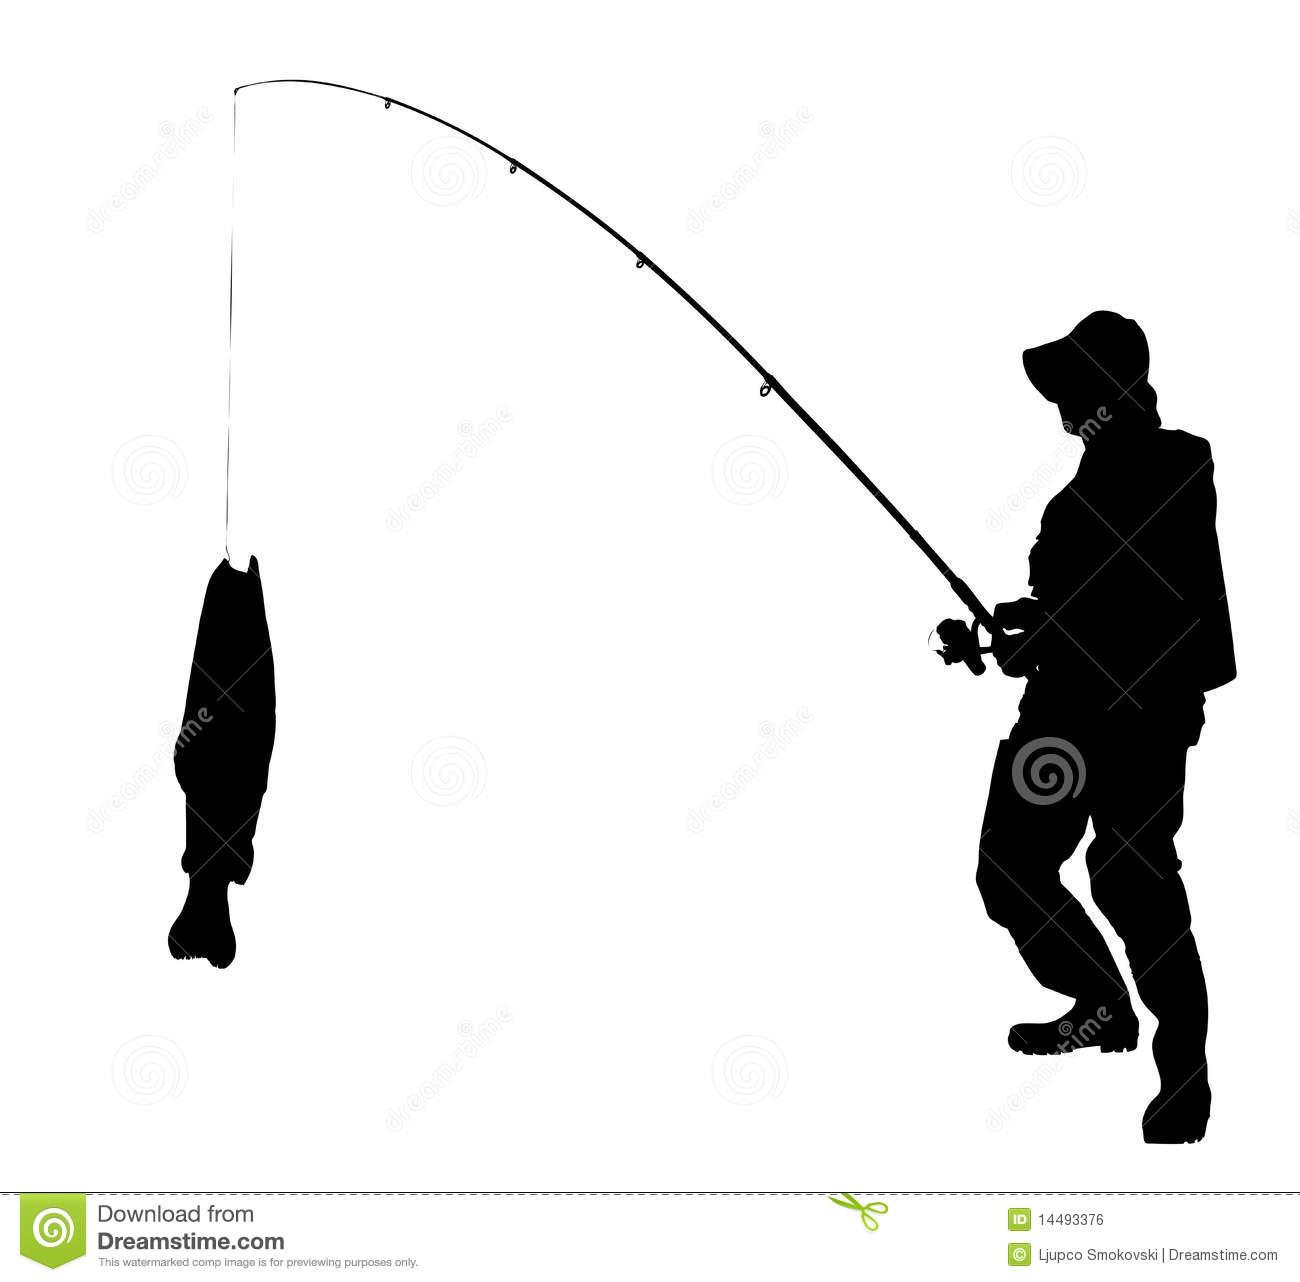 1300x1282 Resultado De Imagen Para Siluetas De Pescadores Peces